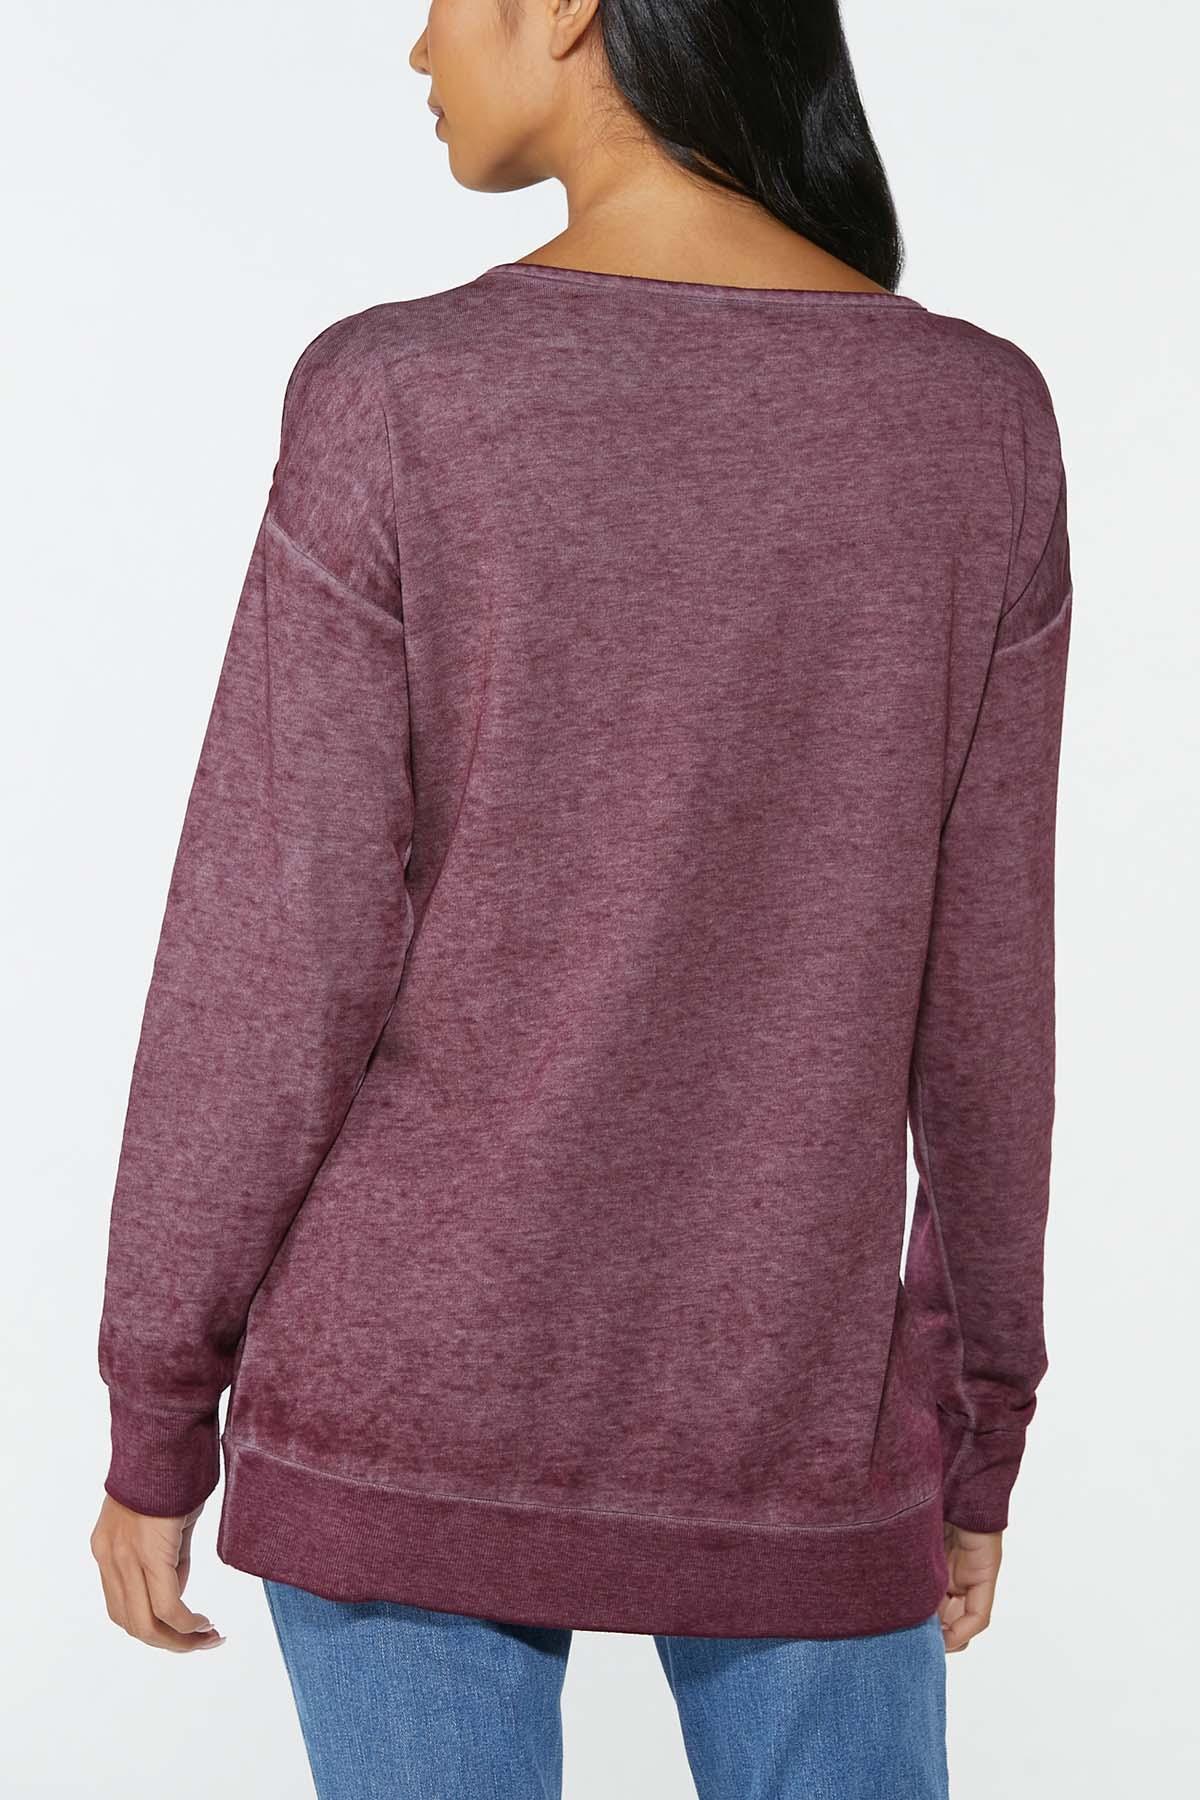 Faith Cold Shoulder Sweatshirt (Item #44766610)